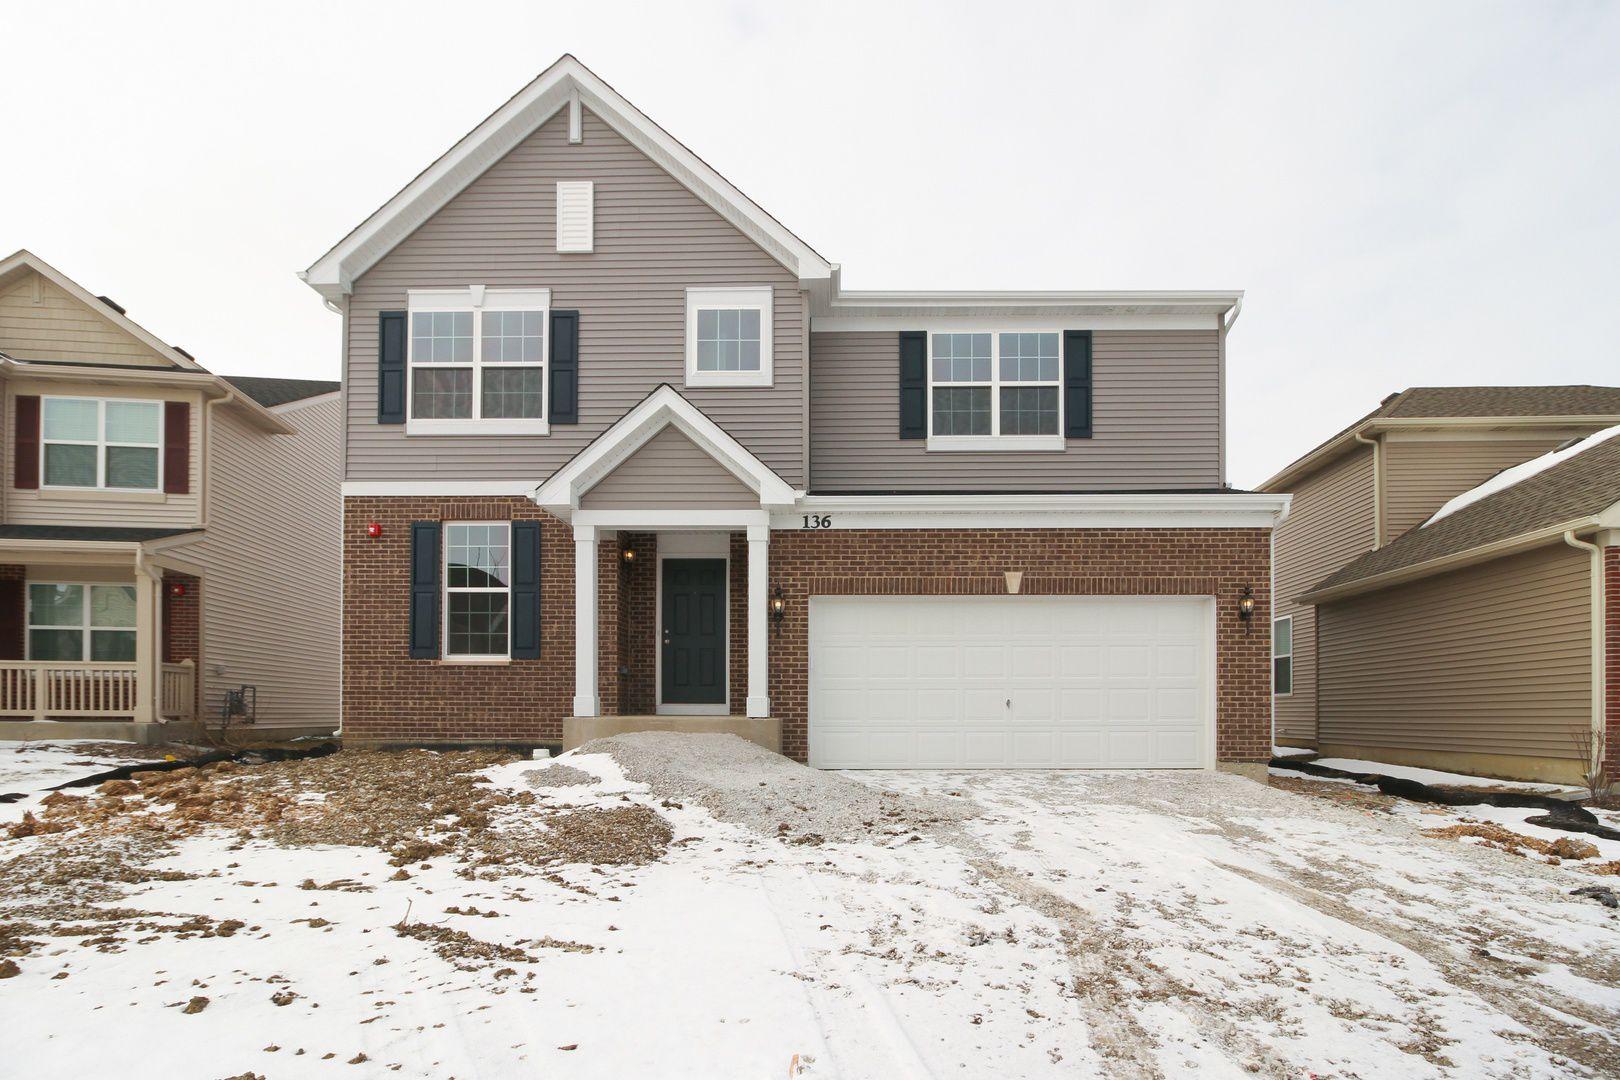 136 Bowman St, Matteson, IL 60443 - 4 Bed, 3 Bath Single-Family Home - MLS  #10258239 - 10 Photos | Trulia